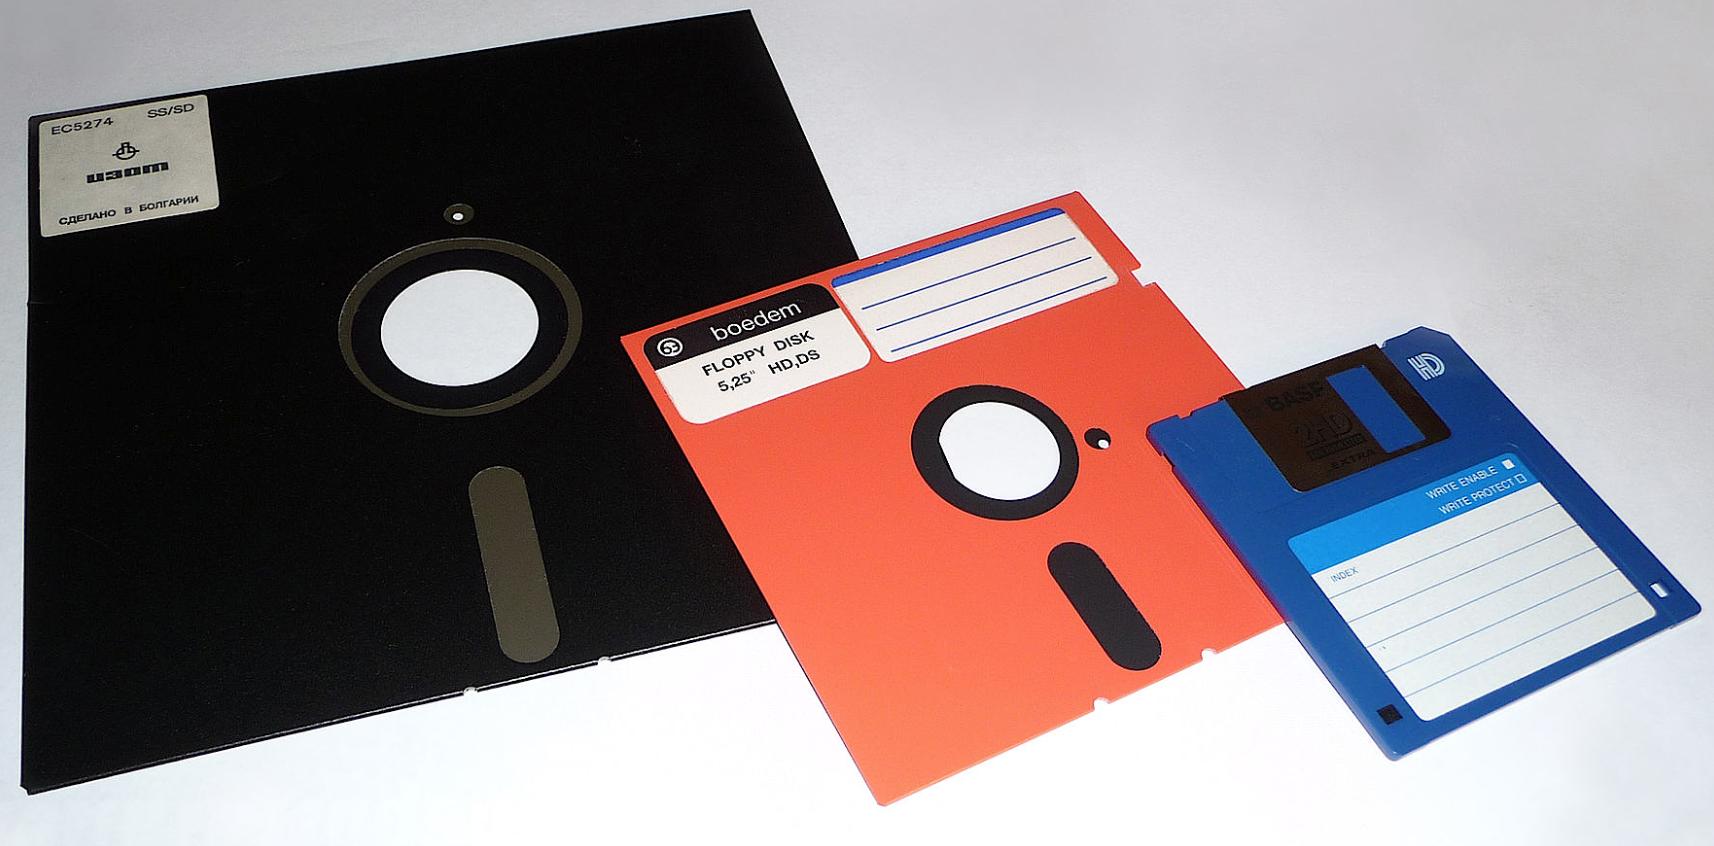 floppy_disk_storia